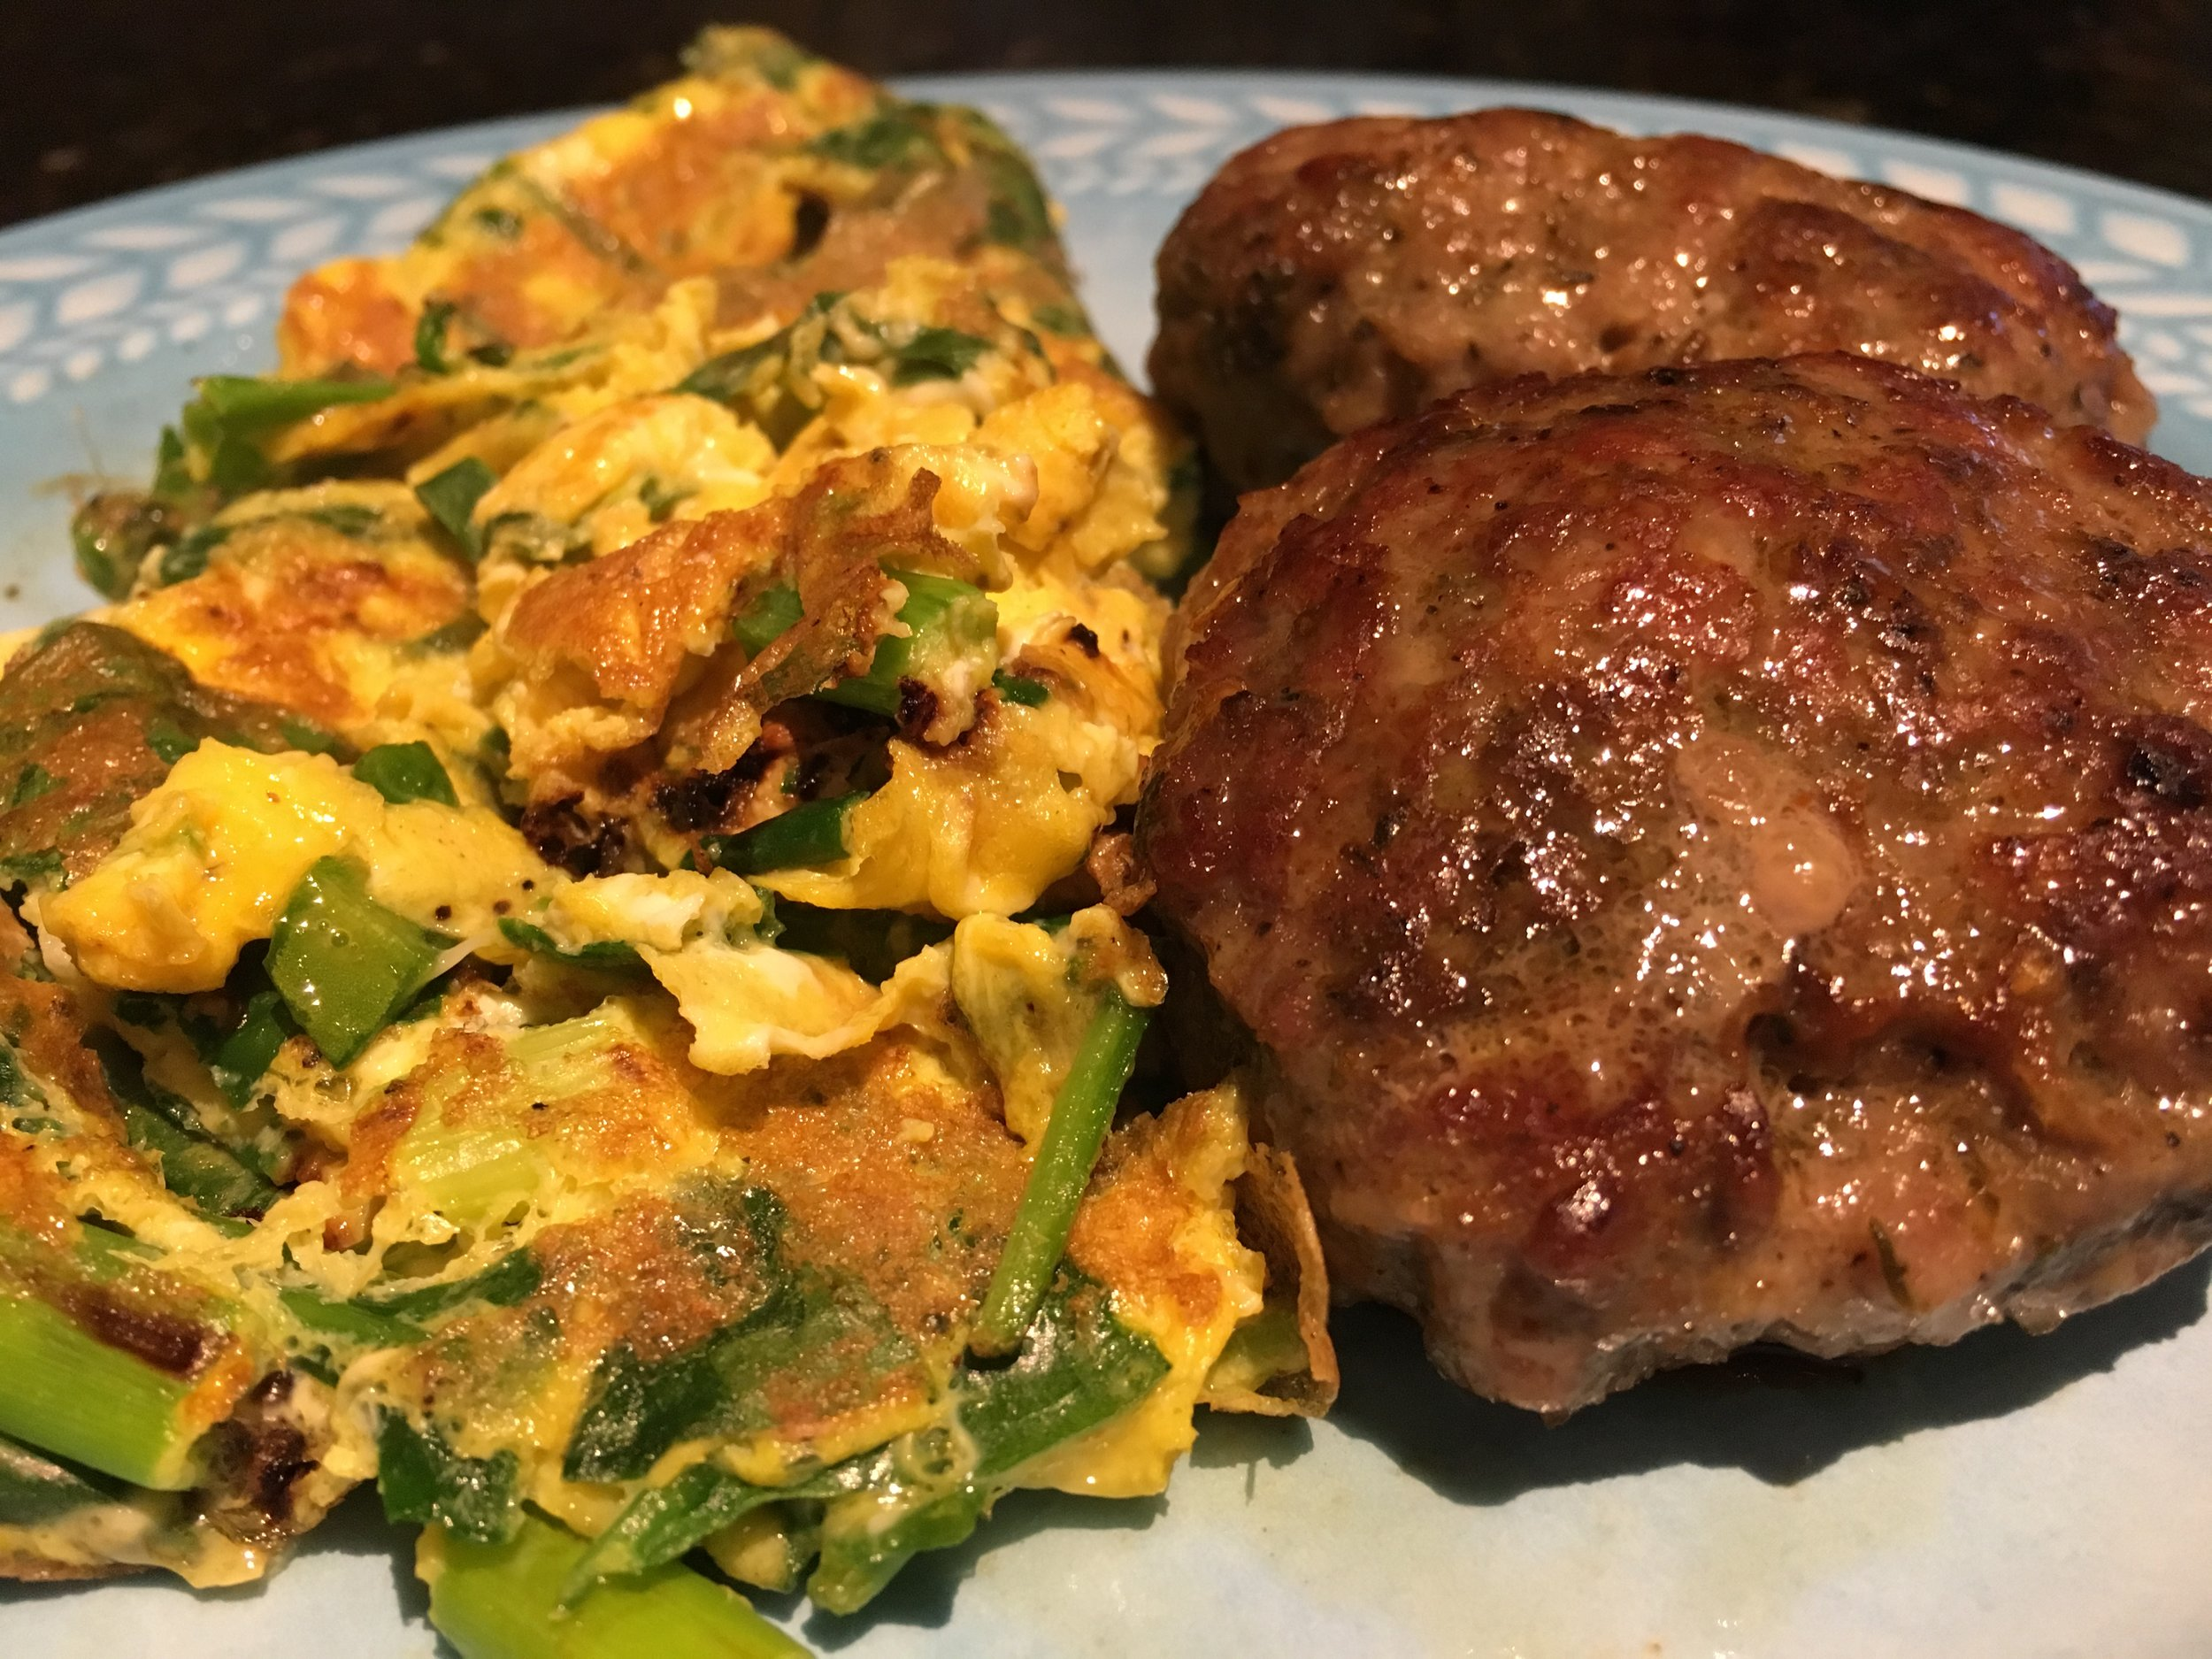 Eggs & Homemade Breakfast Sausage.JPG